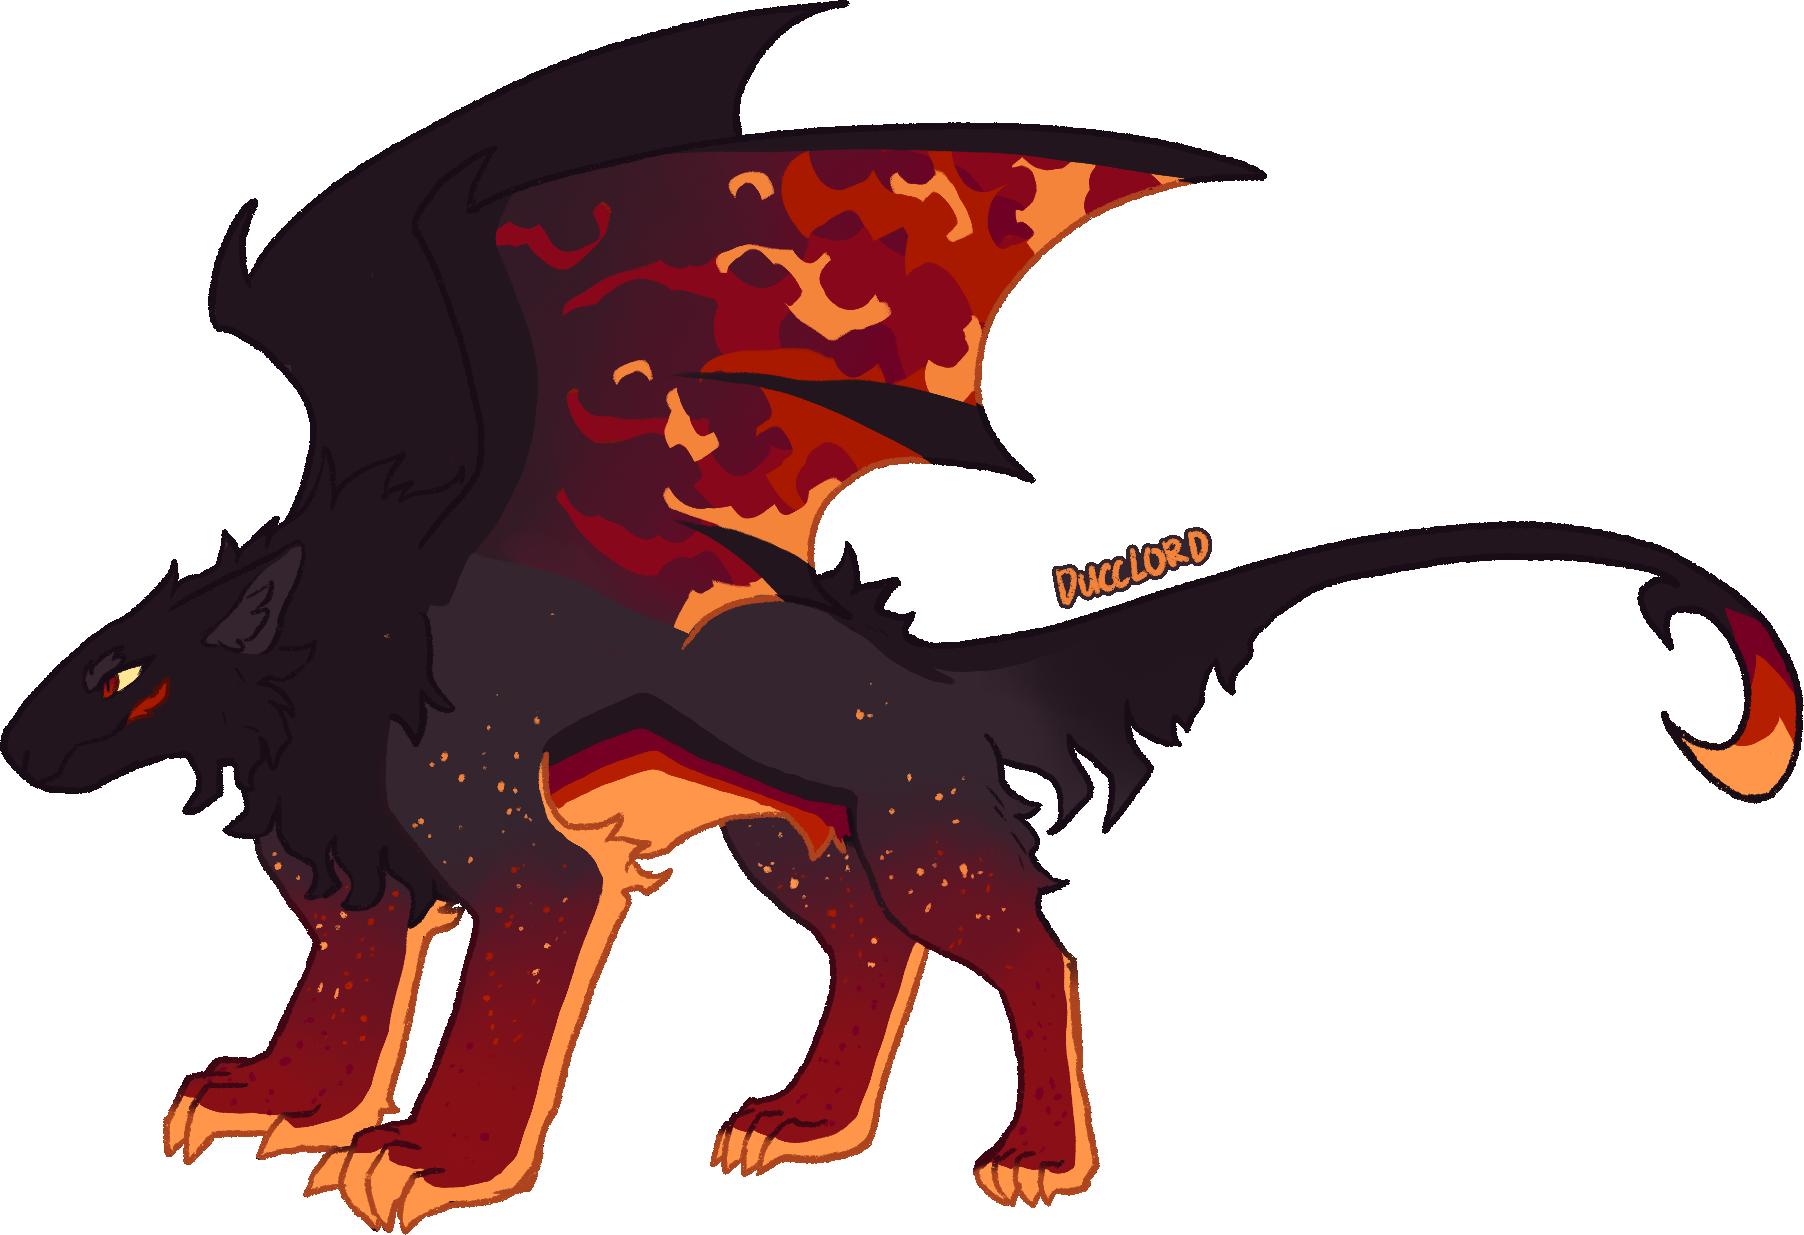 Vesp-053: Keahi